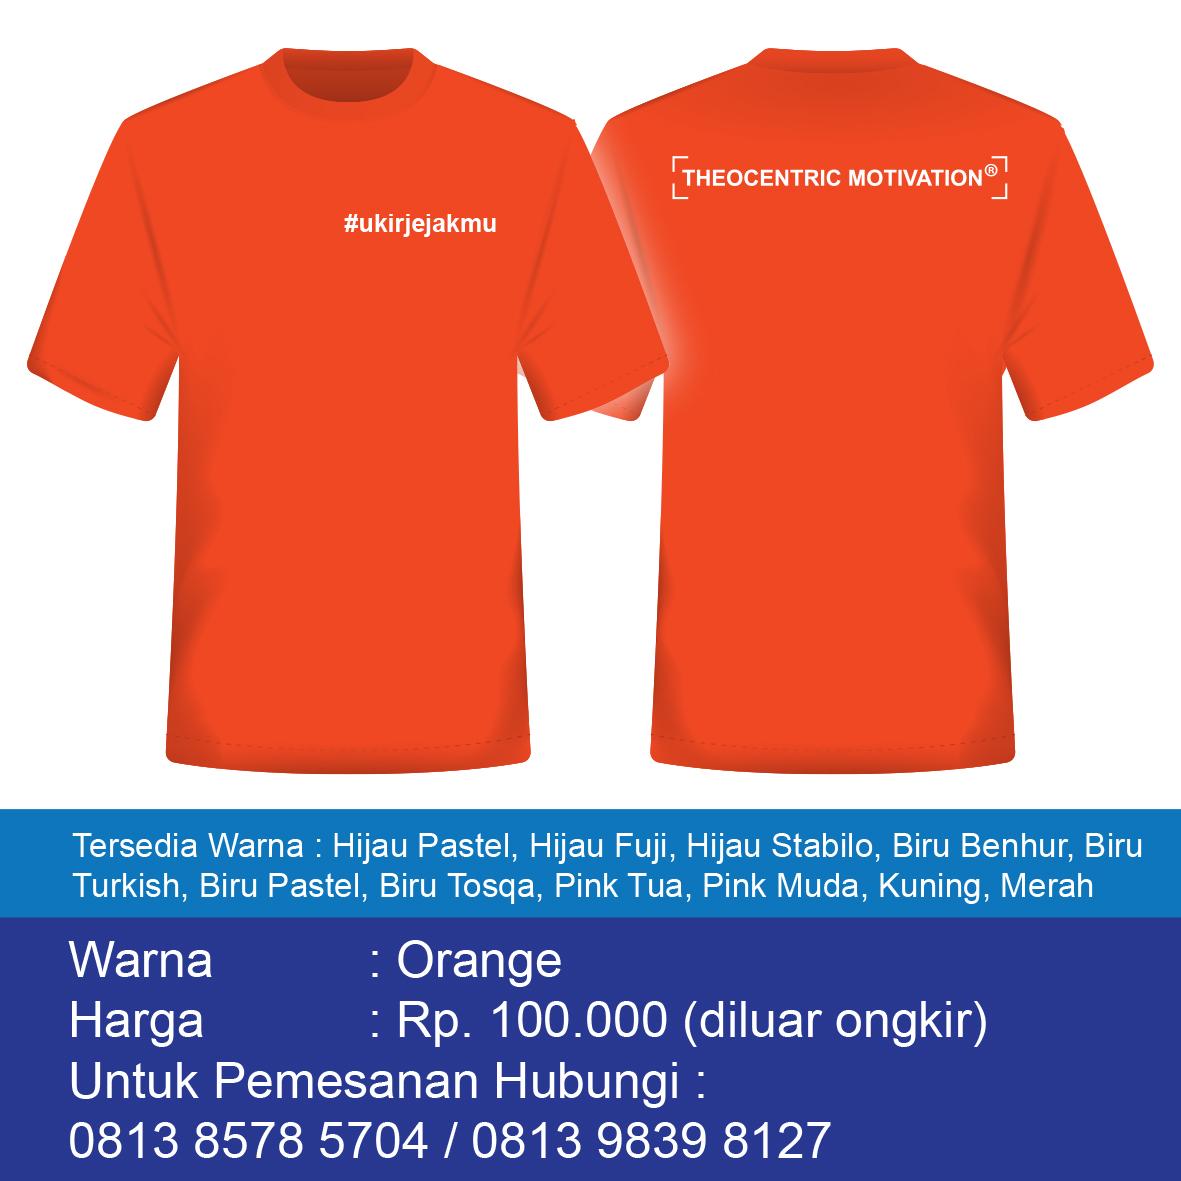 Ukir Jejakmu-Orange